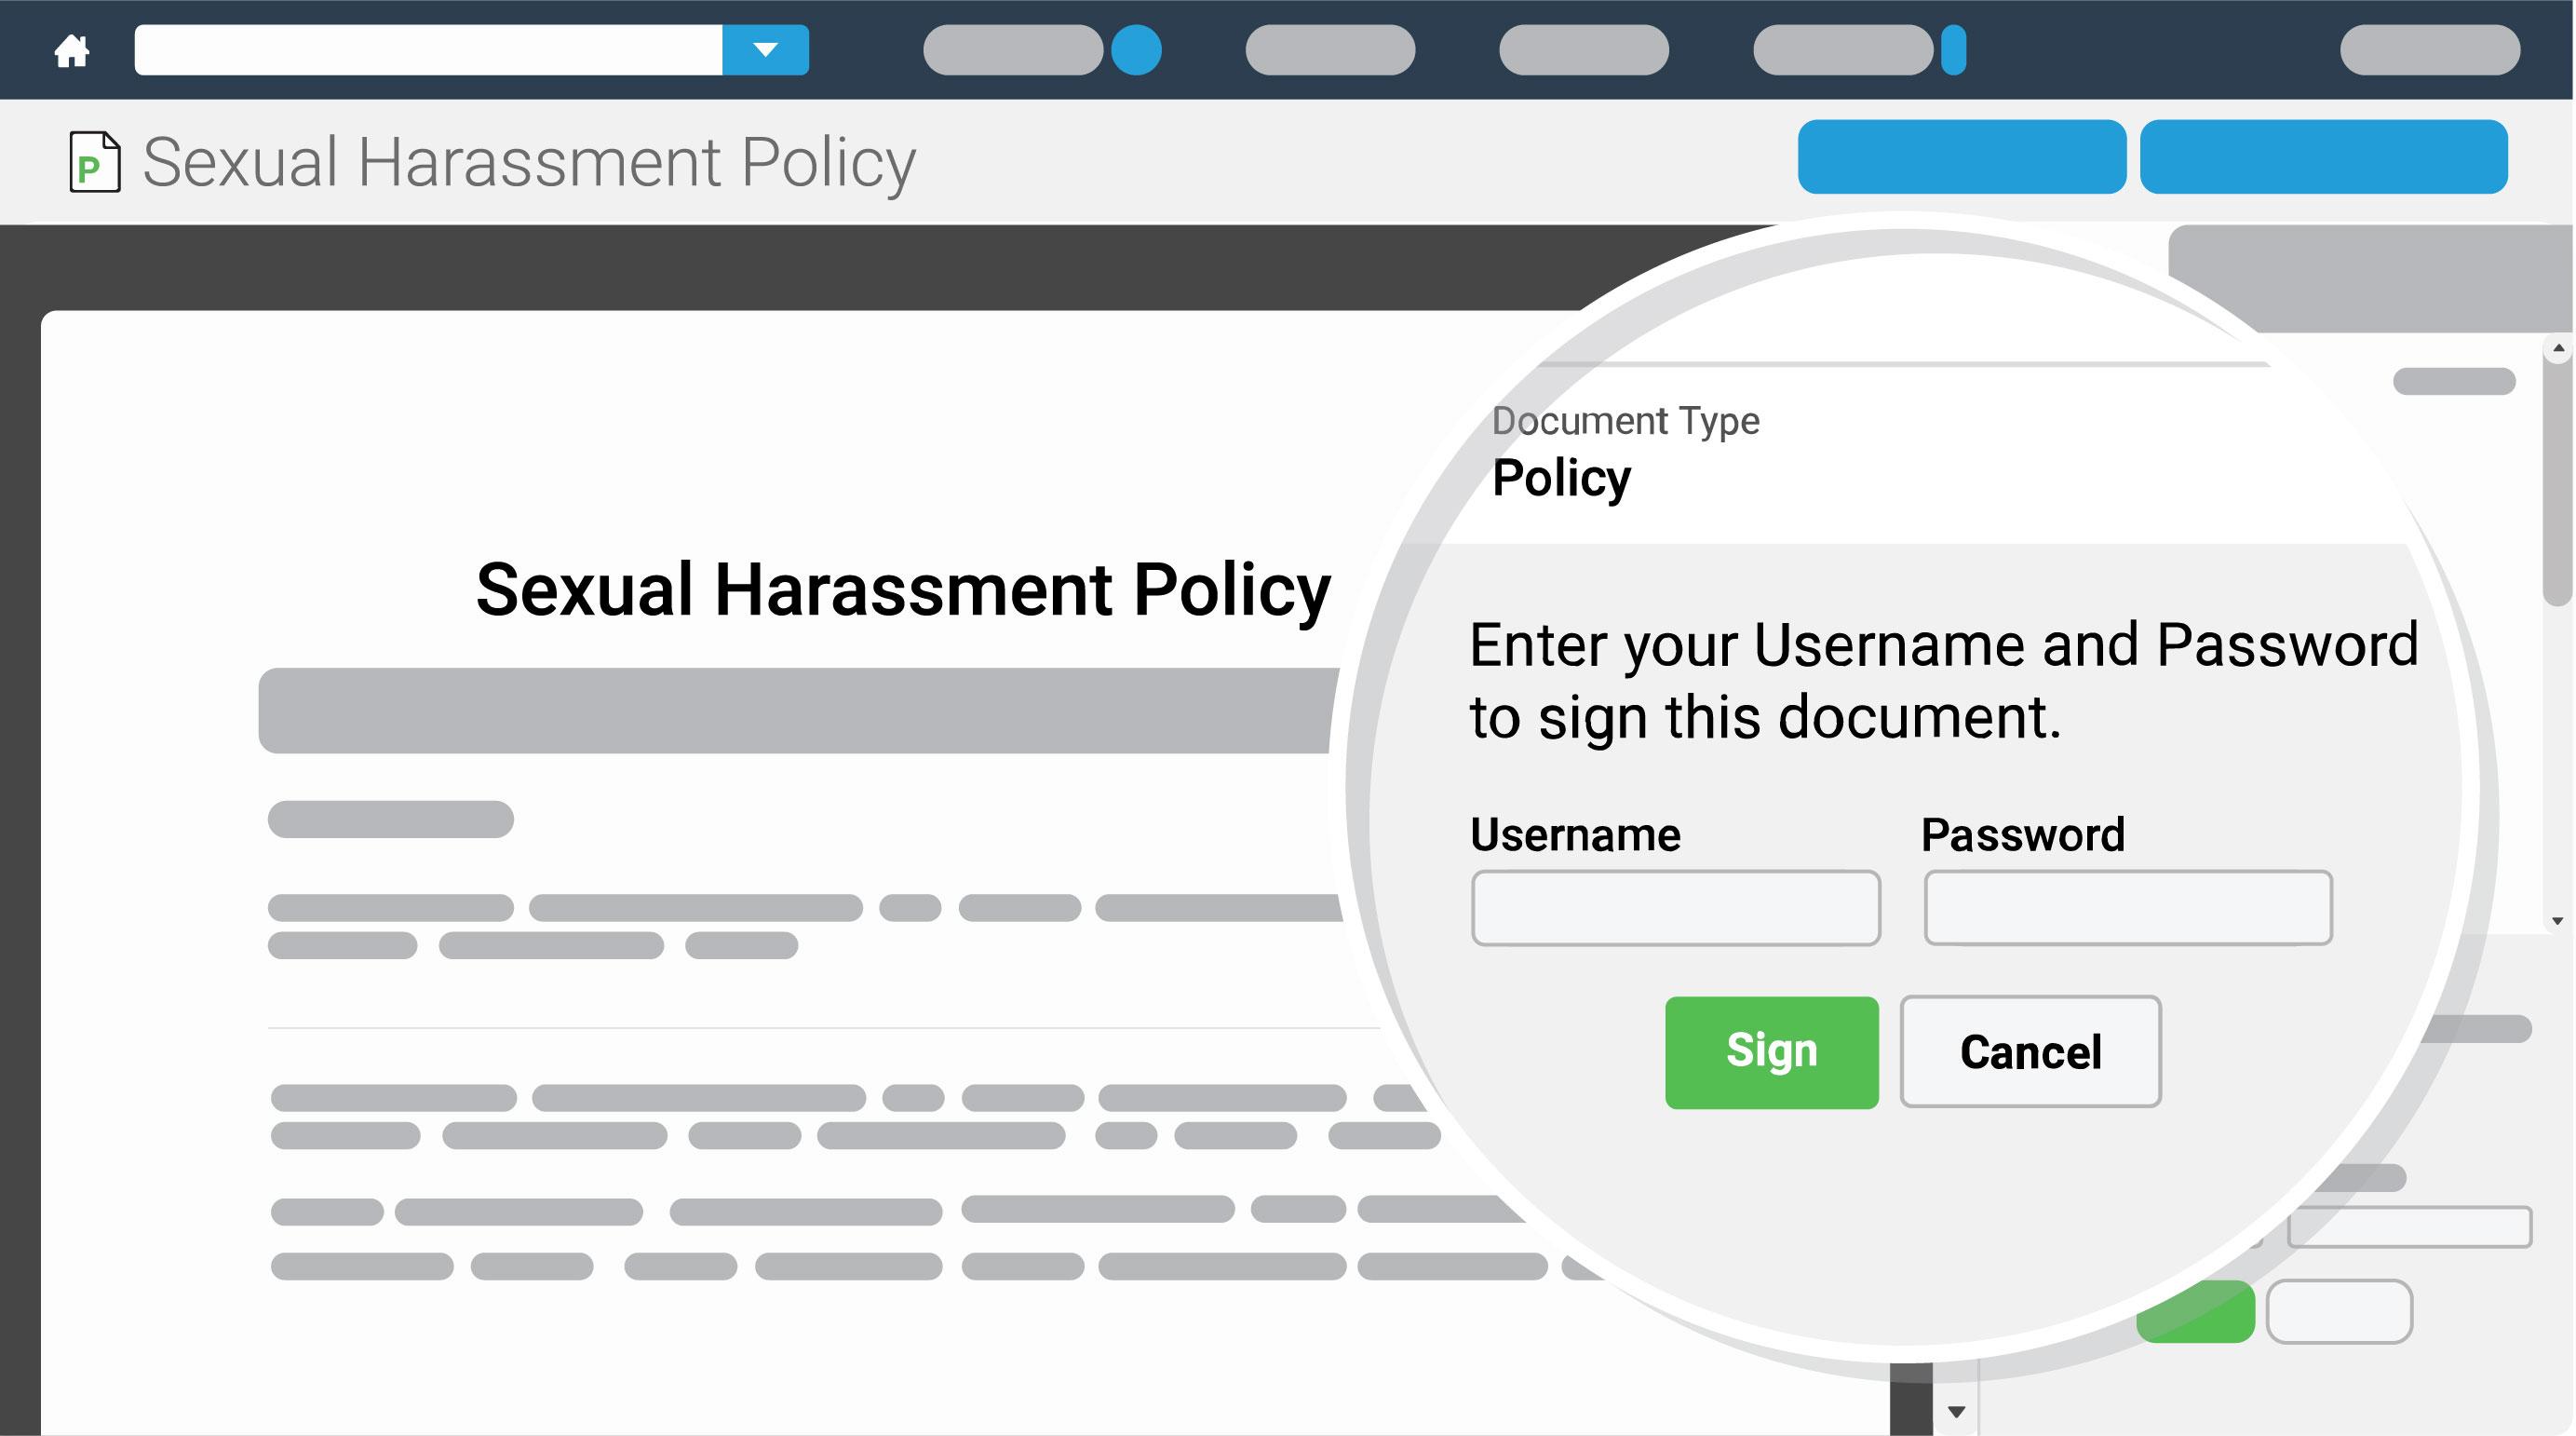 powerdms-application-screens-document-sign-sexual-harrasment-01